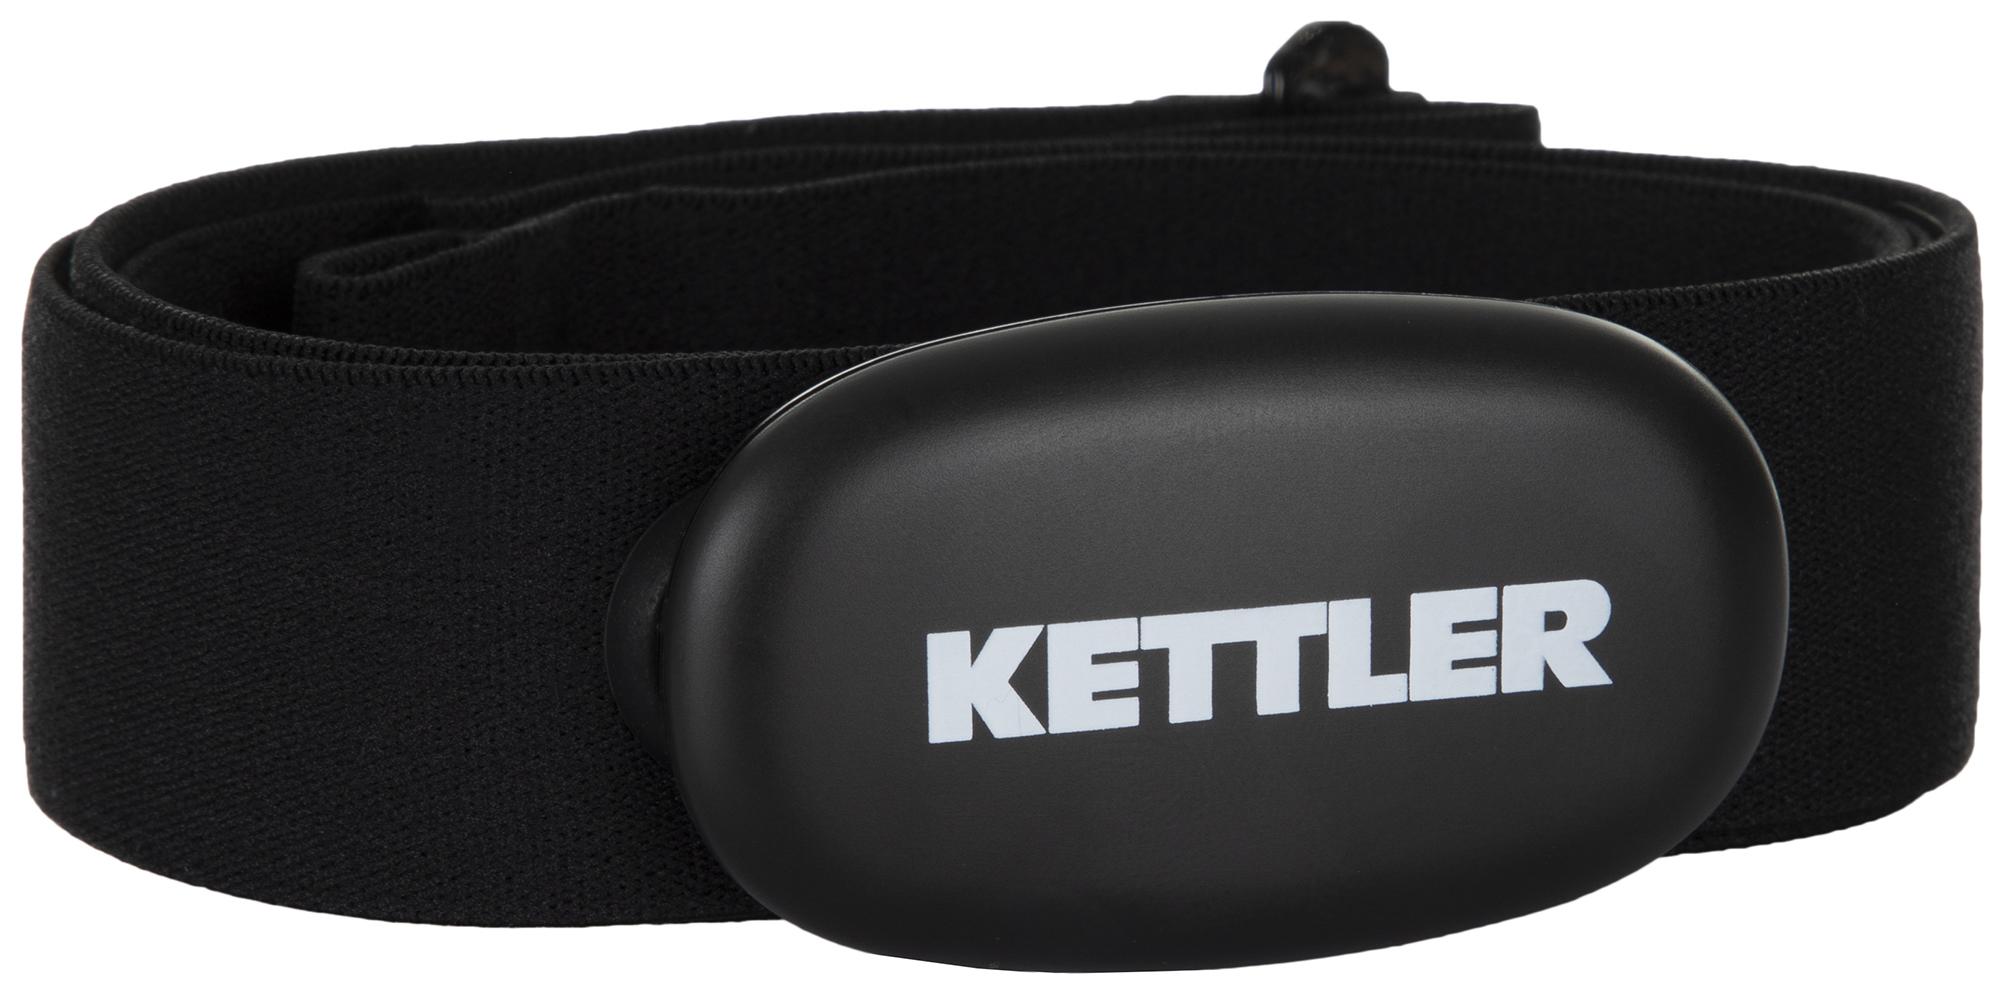 Kettler KETTLER 7930-610 Cardio Pulse kettler kettler rivo 47692 150